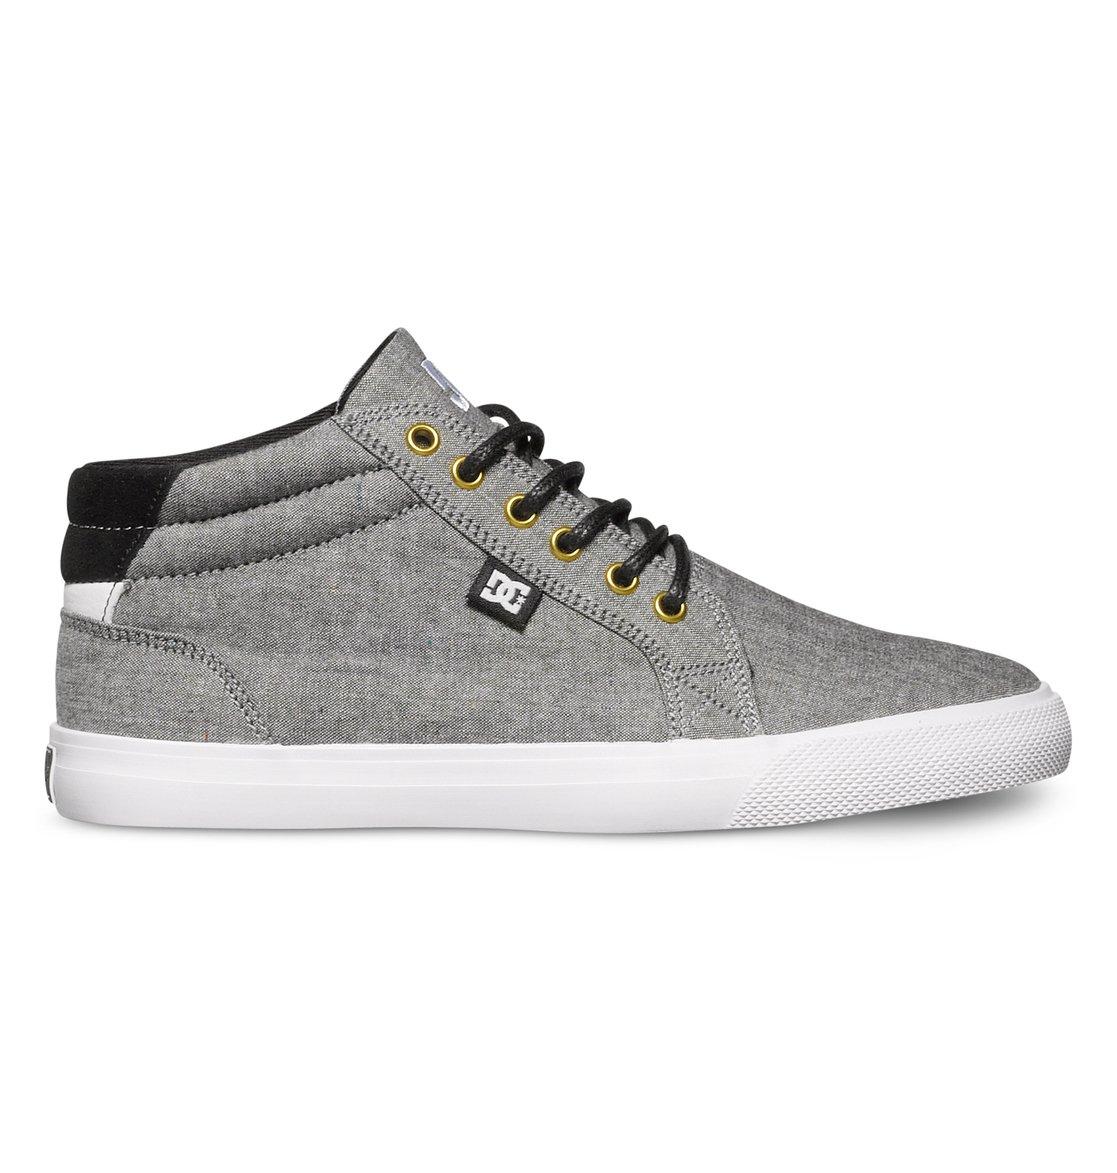 Council Mid TX Suede - Dcshoes���� ������� ������ Council Mid TX Suede �� DC Shoes � ������� �� ��������� ����� 2015�. ��������������: ����������� ����, ����������� ���������, ��������������� � ����������� ���, �������������� � ���������� ������� Impact S, ������ � �������� (���� � ���������) � ������ (�������).<br>